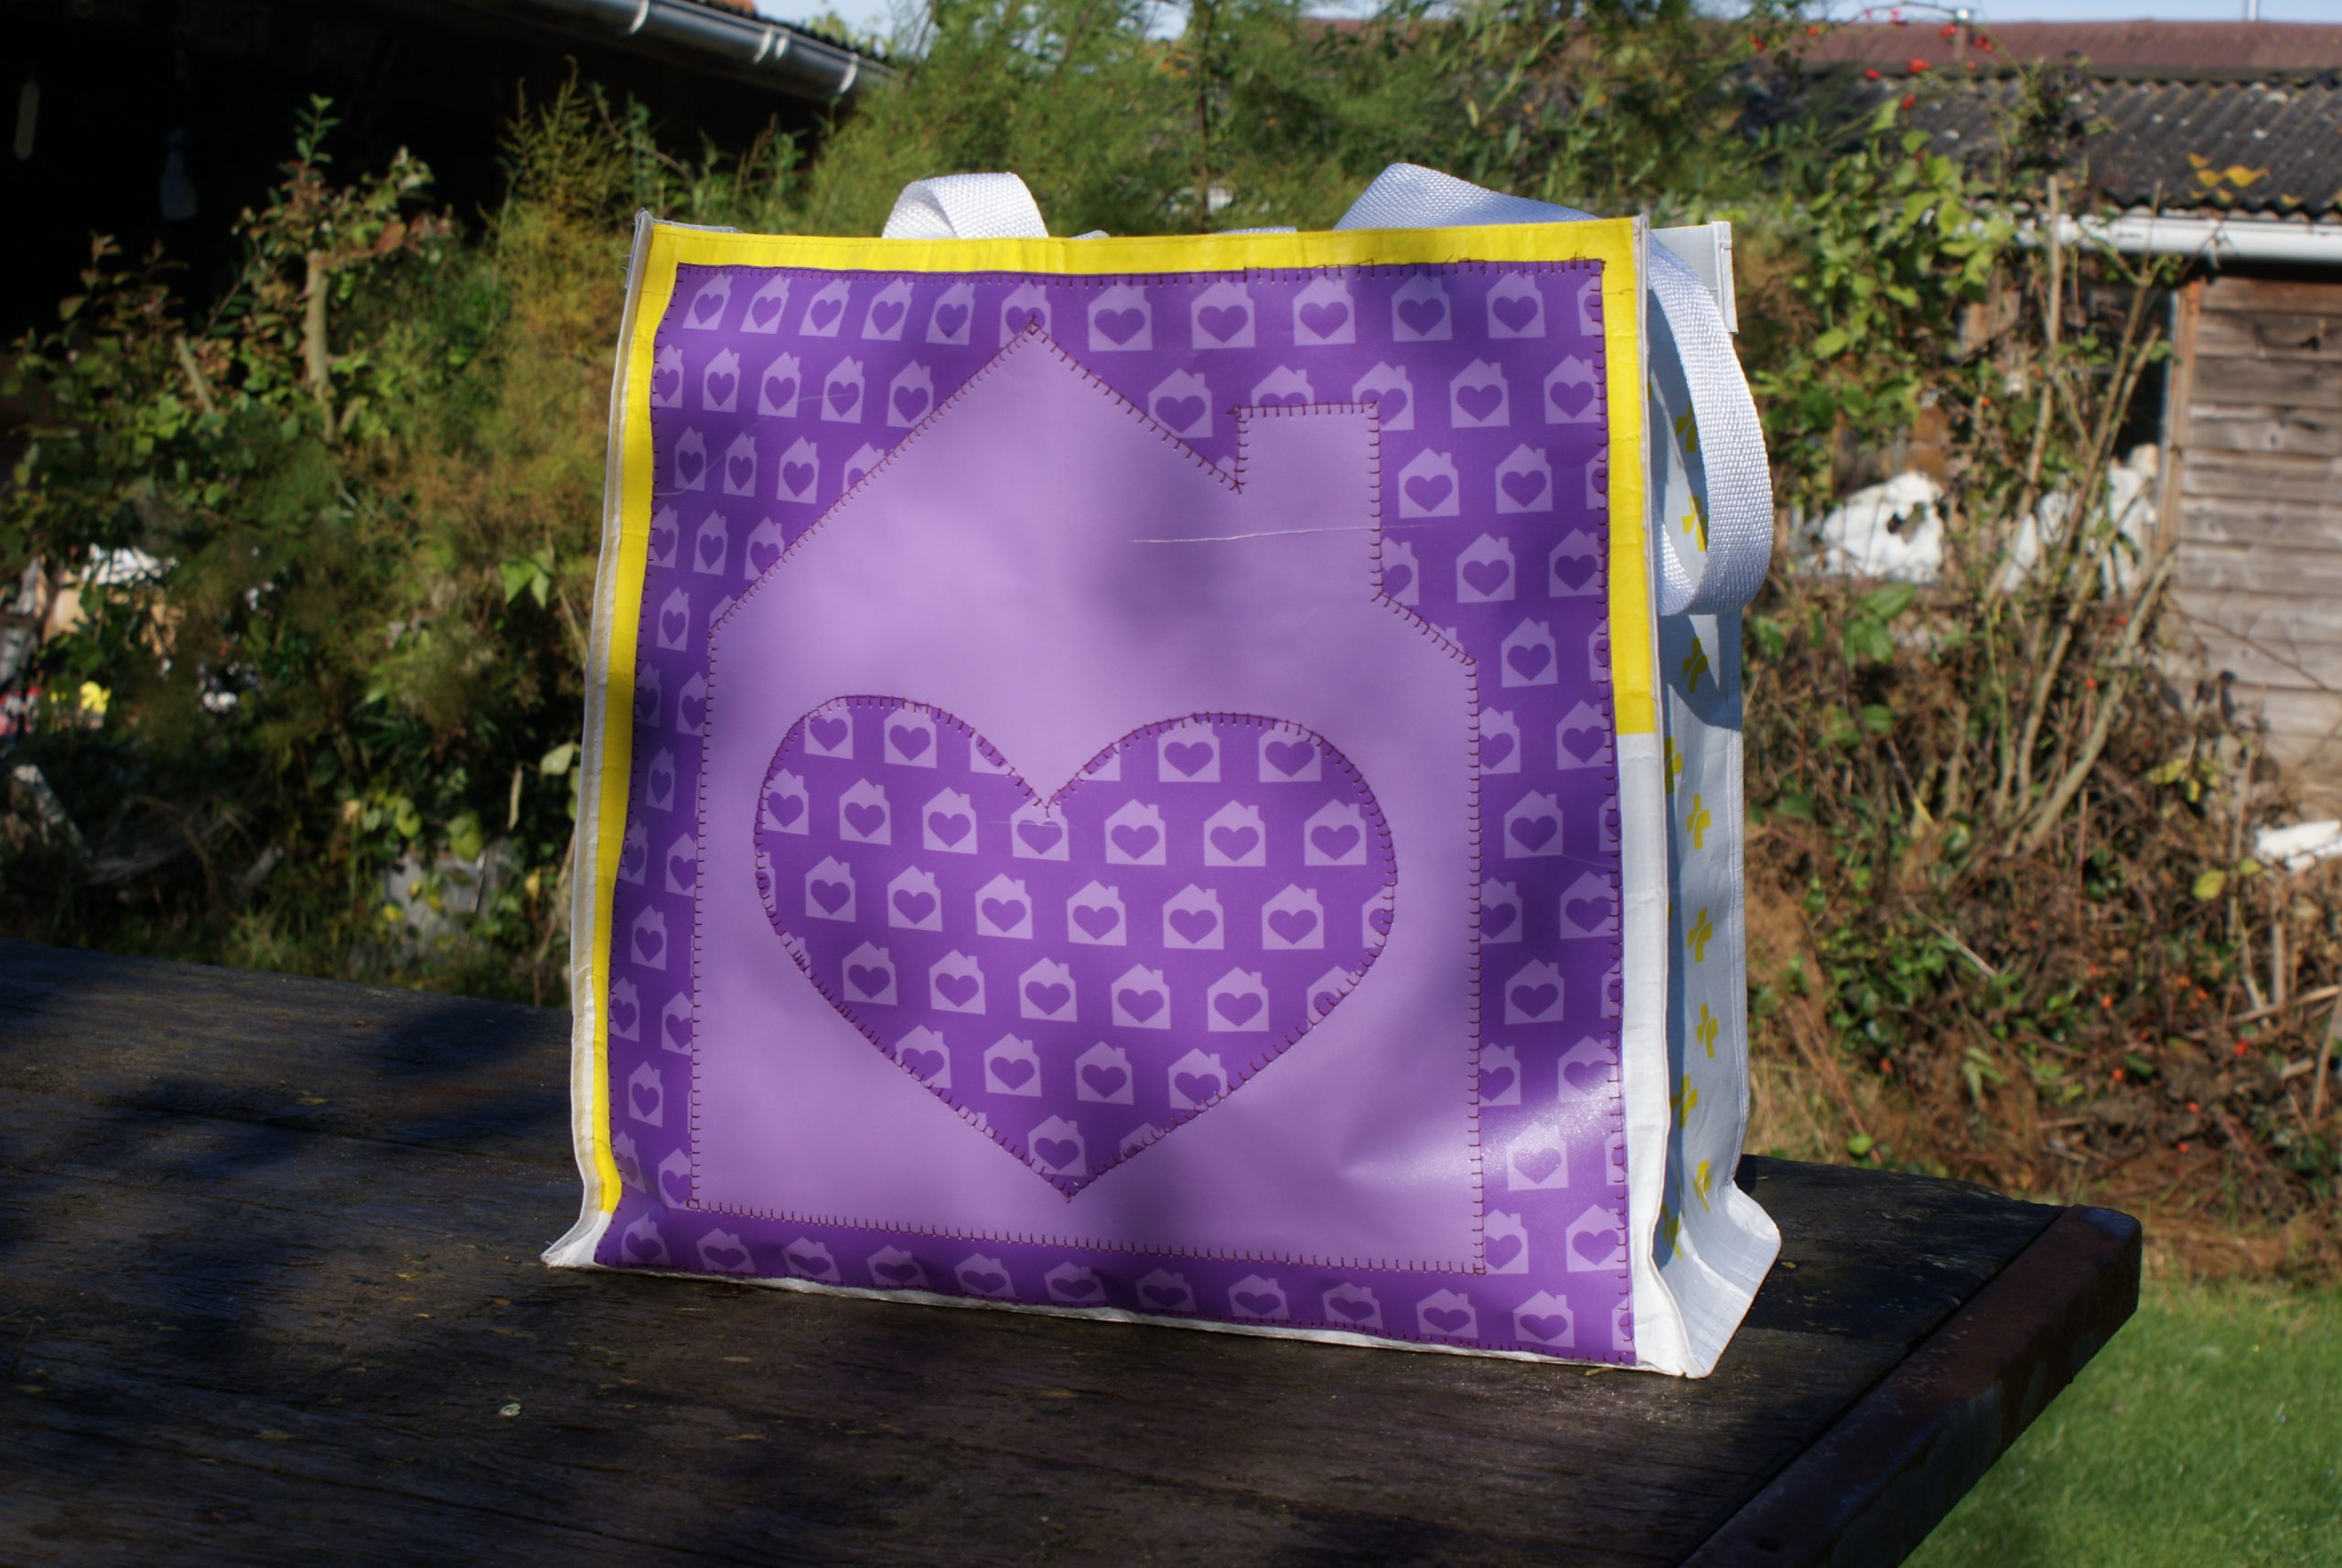 How to pimp a bag for beginners - embellish a bag - tote bag